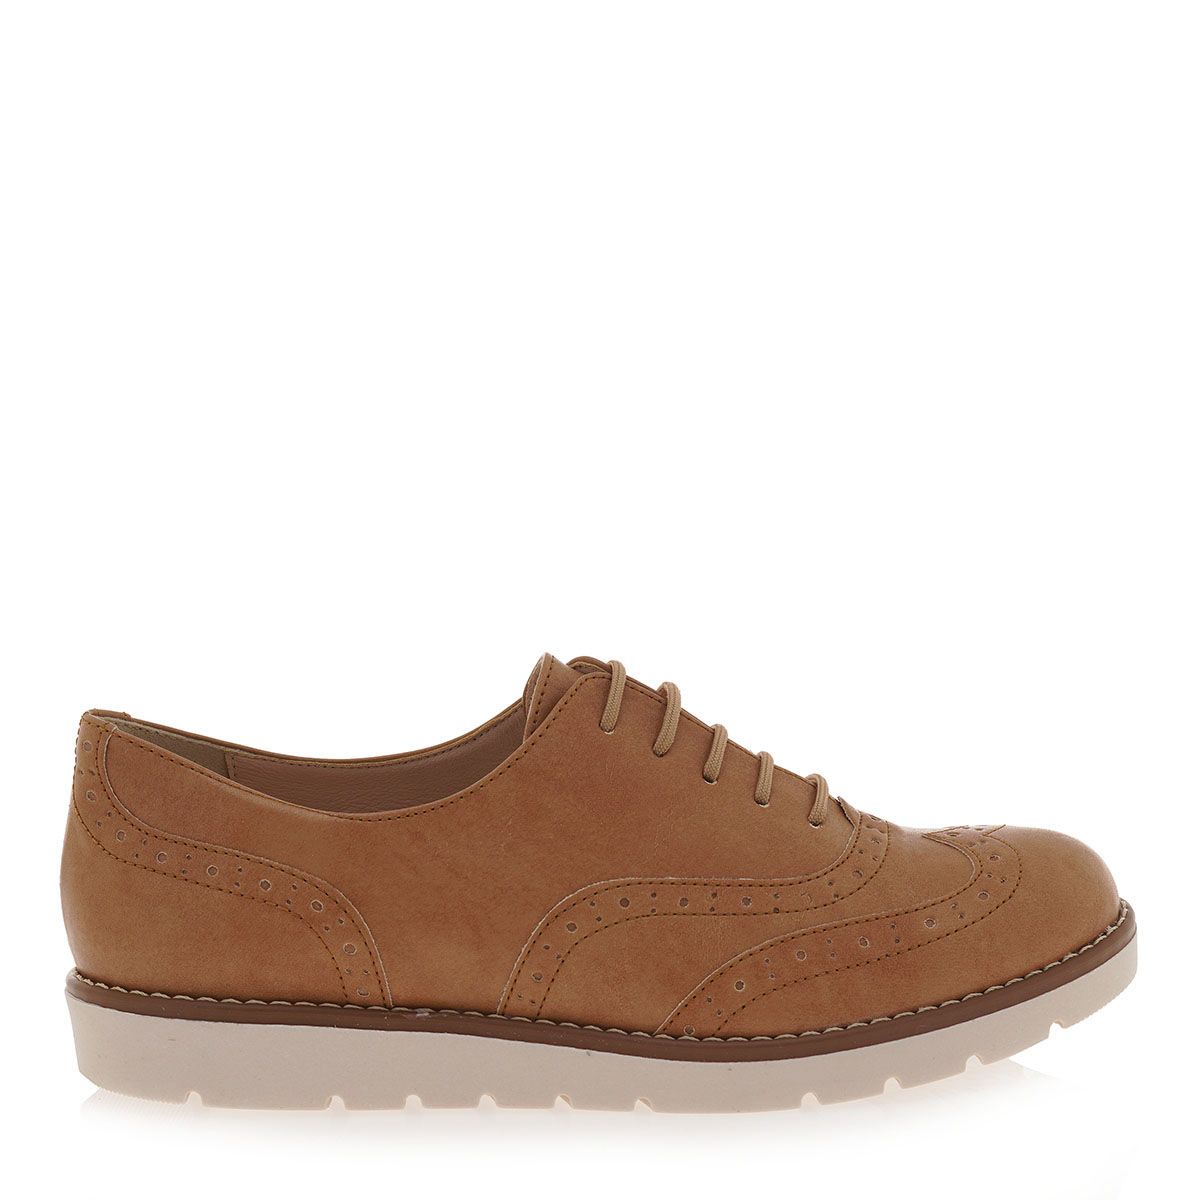 2da7c83e7c5 Γυναικεία παπούτσια OXFORDS σχέδιο: I14175151 | My Lady Shoes